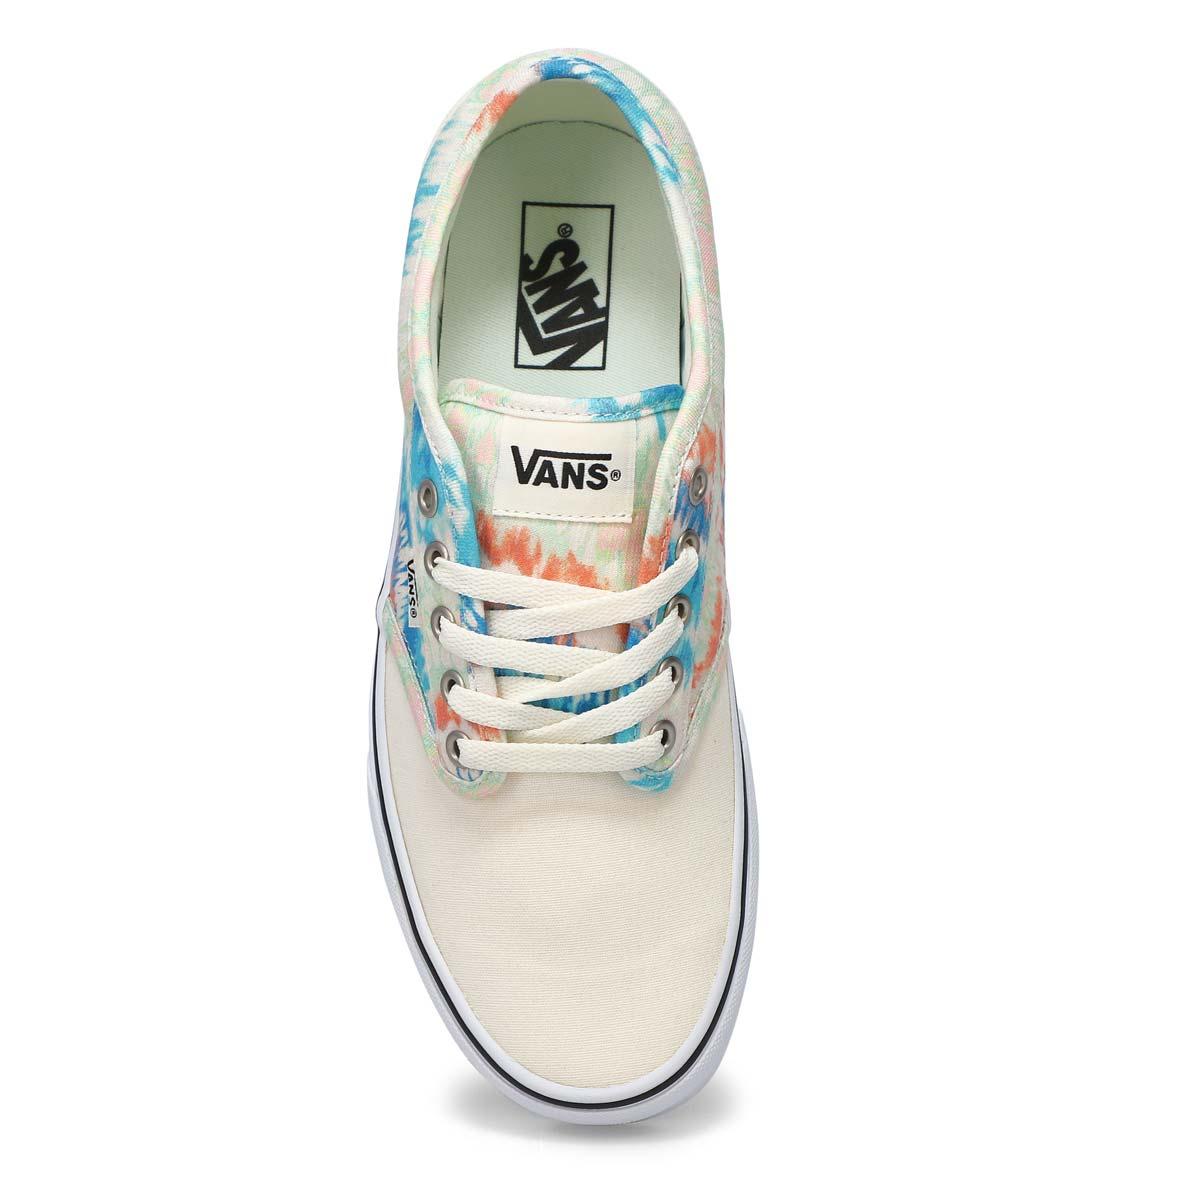 Men's Atwood Sneaker - Tie Dye Marshmallow/White